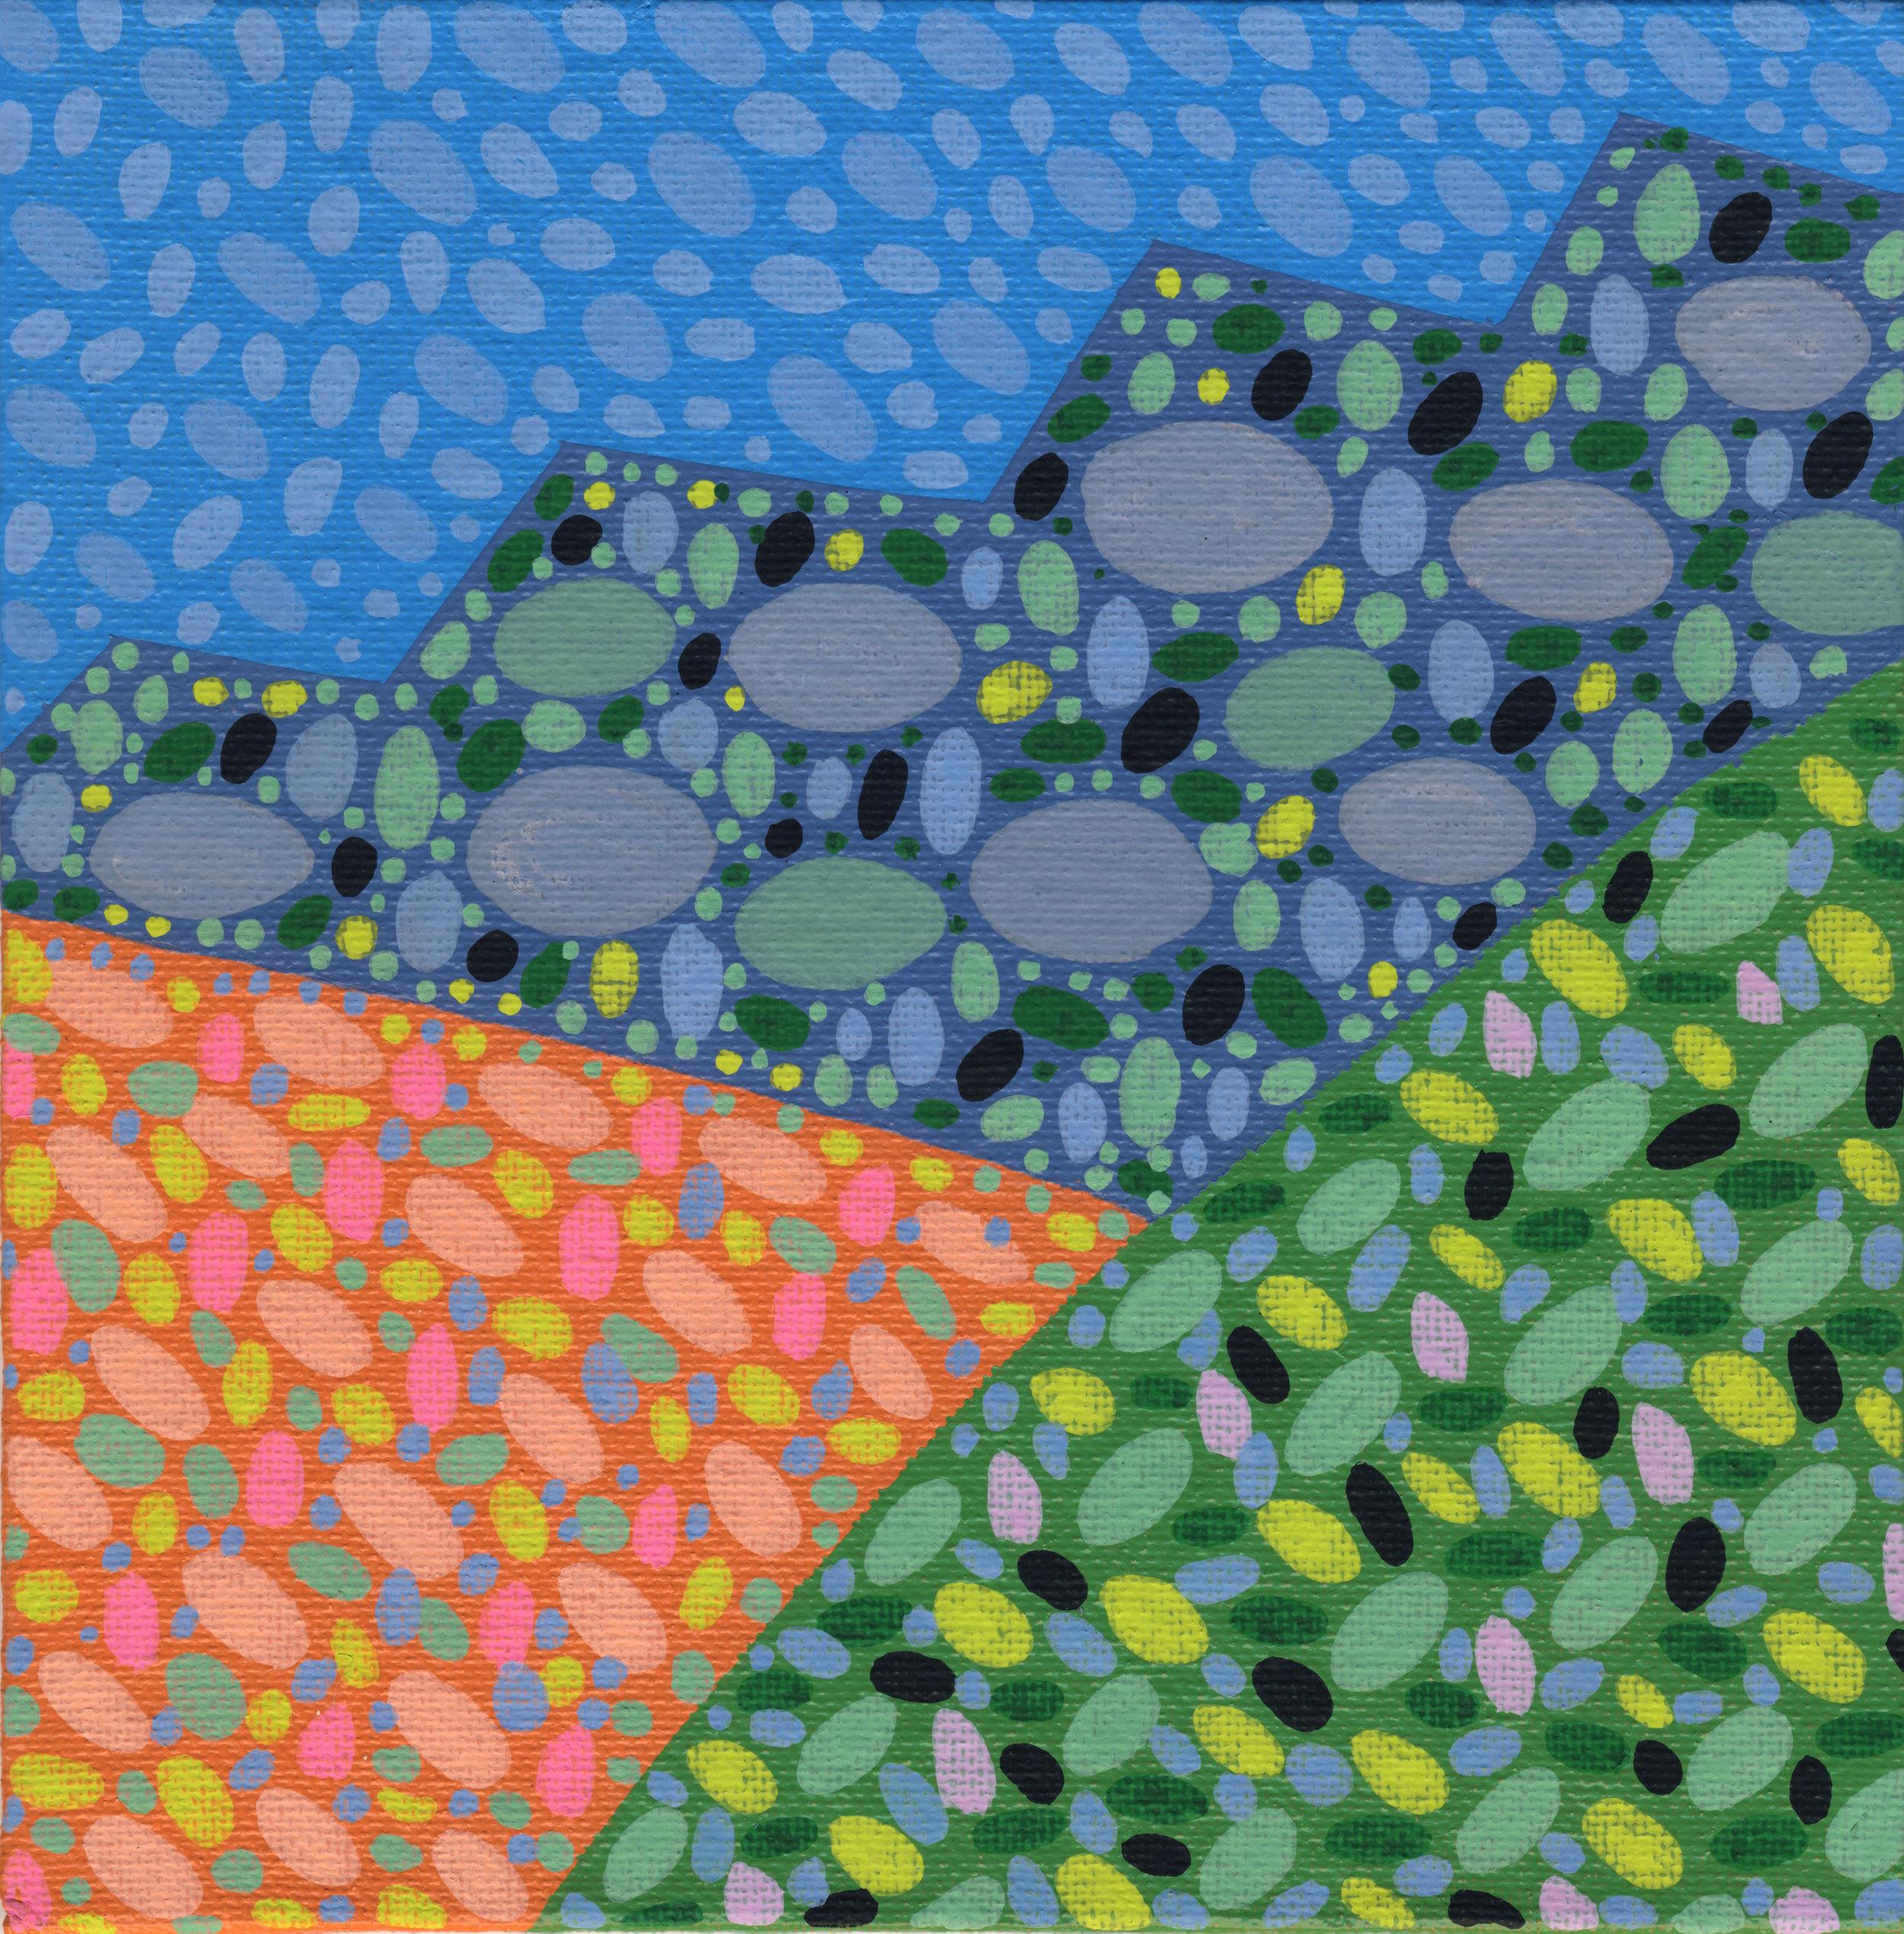 "36/100, Acrylic on canvas panel, 6"" X 6"", 2/11/19"